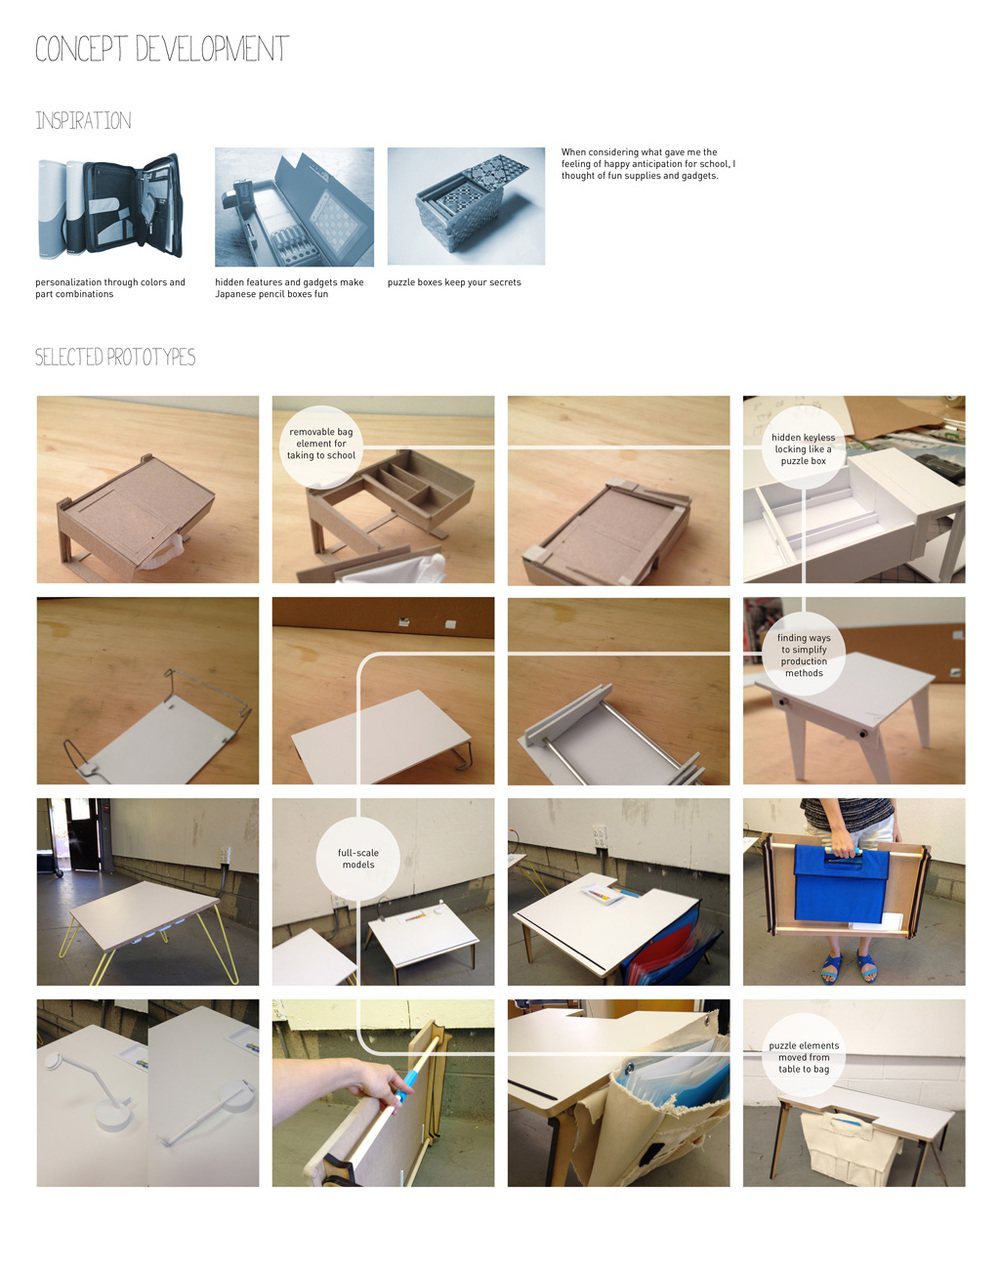 launchpad_website6.jpg